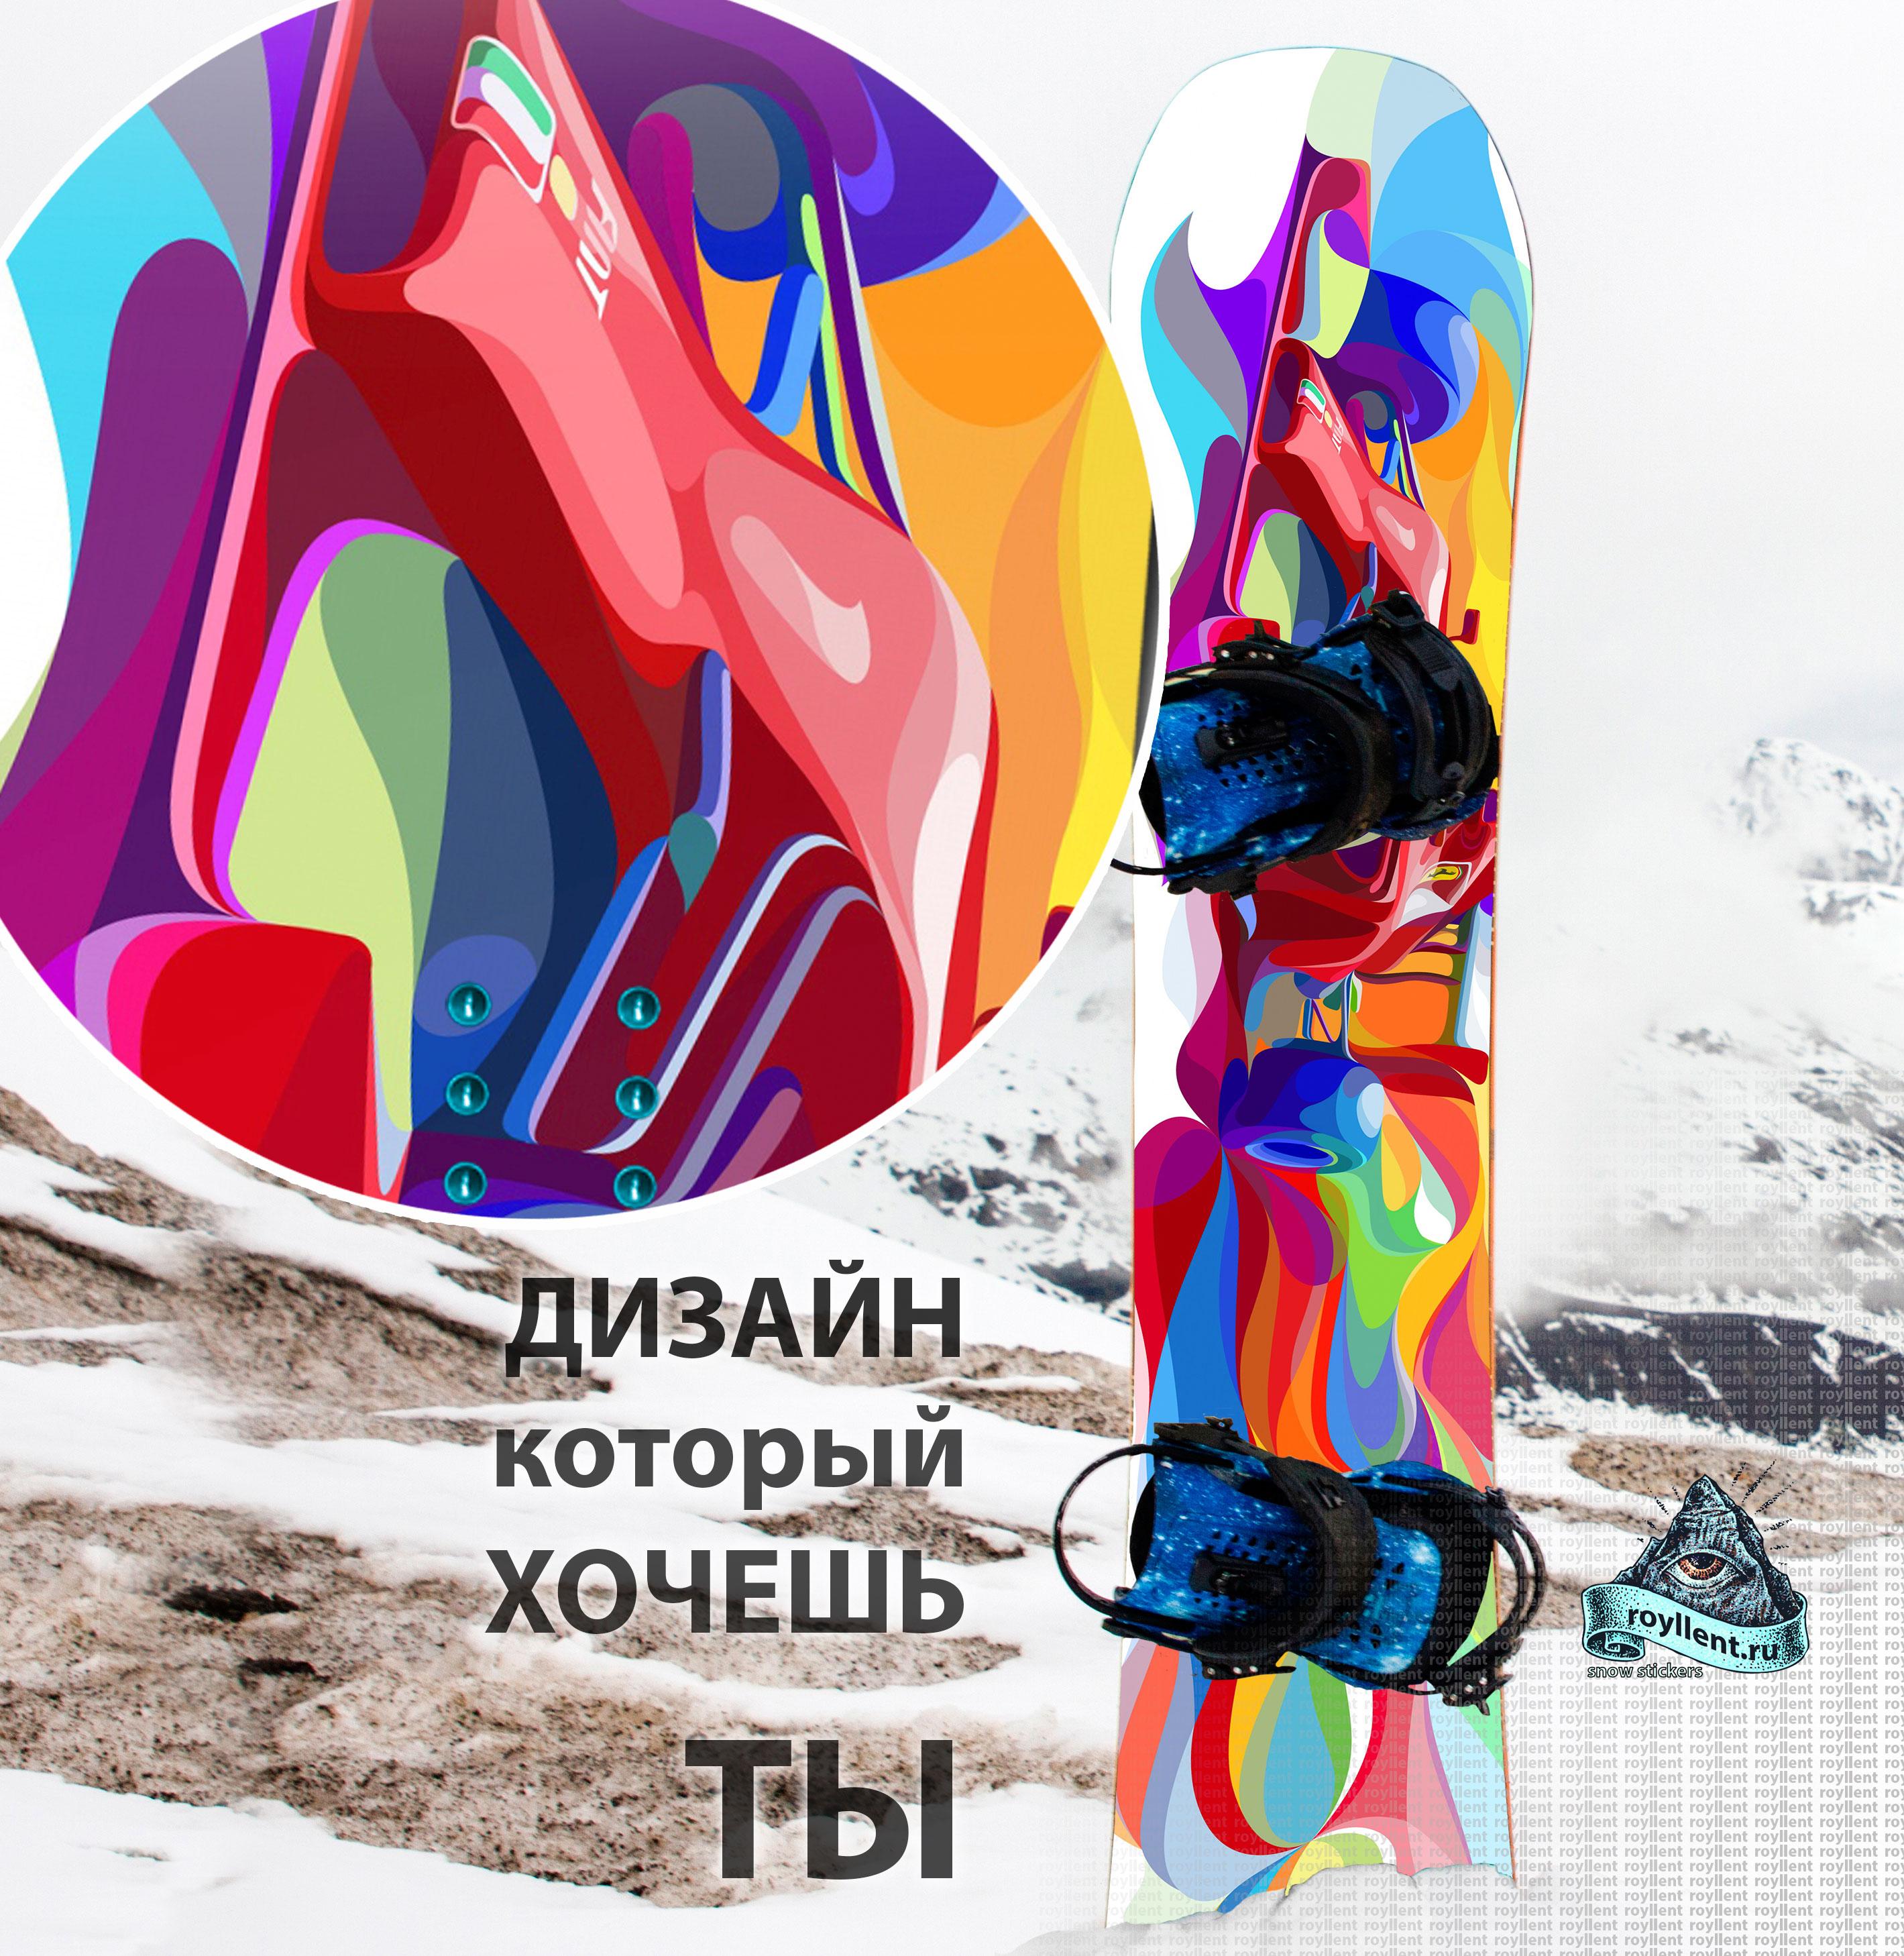 Сноуборд наклейка соревнований формула 1